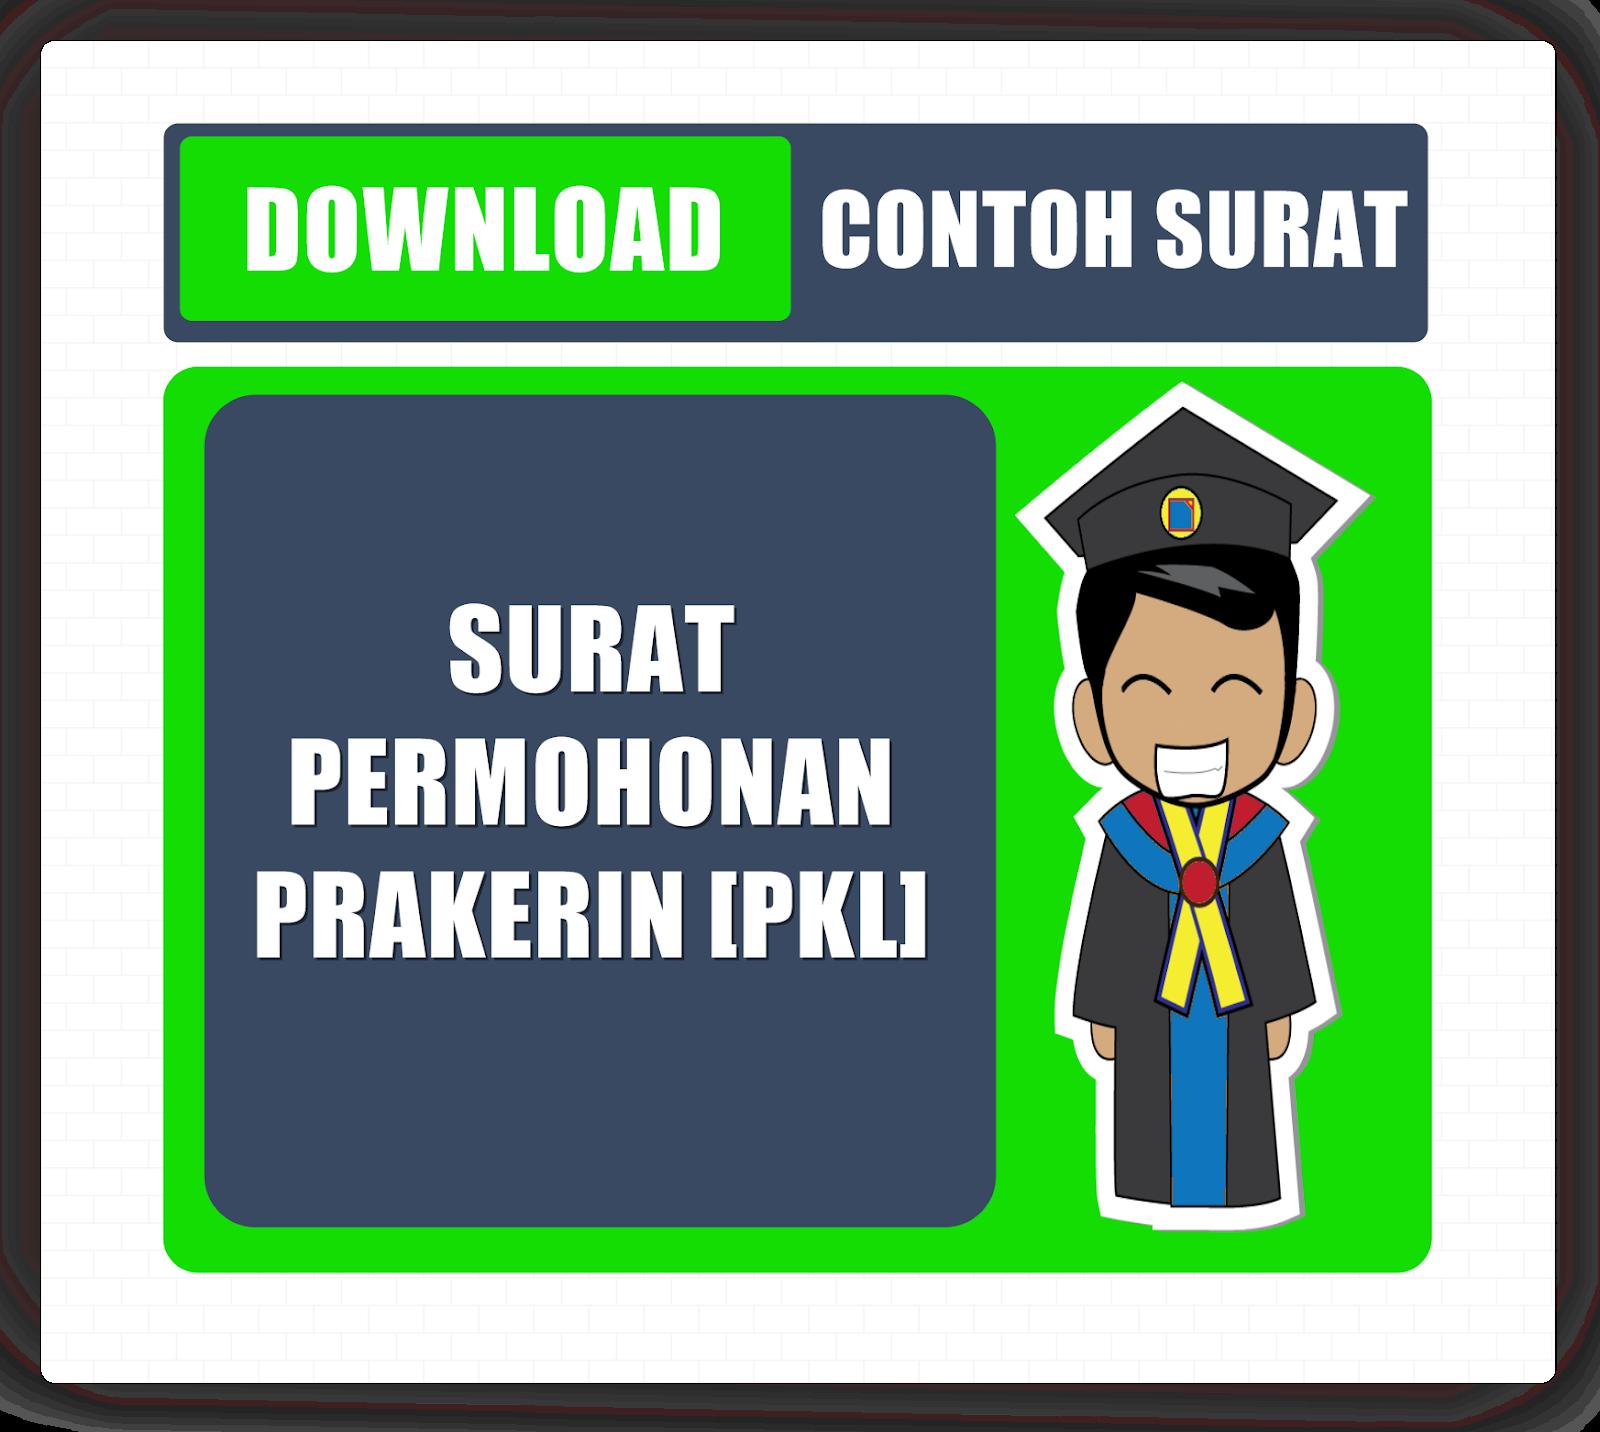 Download Contoh Surat Permohonan Praktek Kerja Industri Pkl Jenjang Smk Pandu Smk